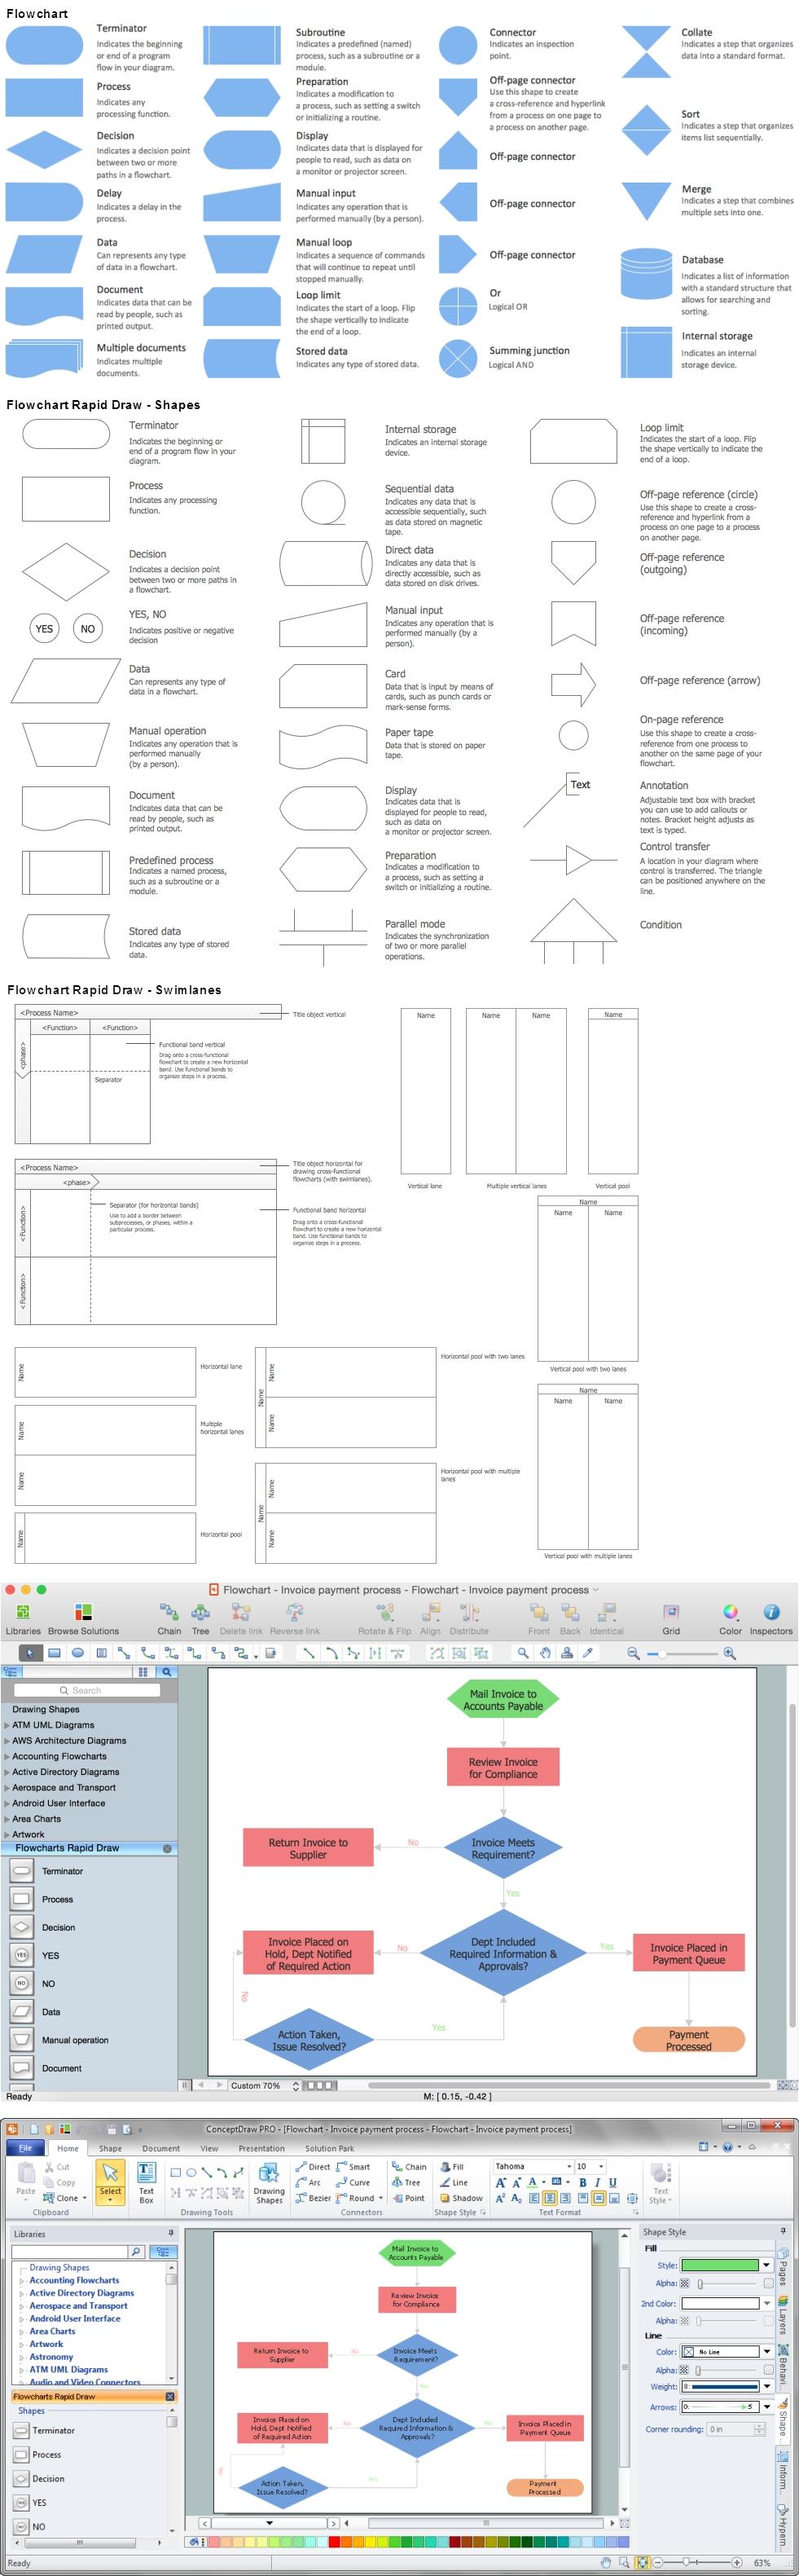 invoice payment process flowchart processing flow chart flow invoice payment process